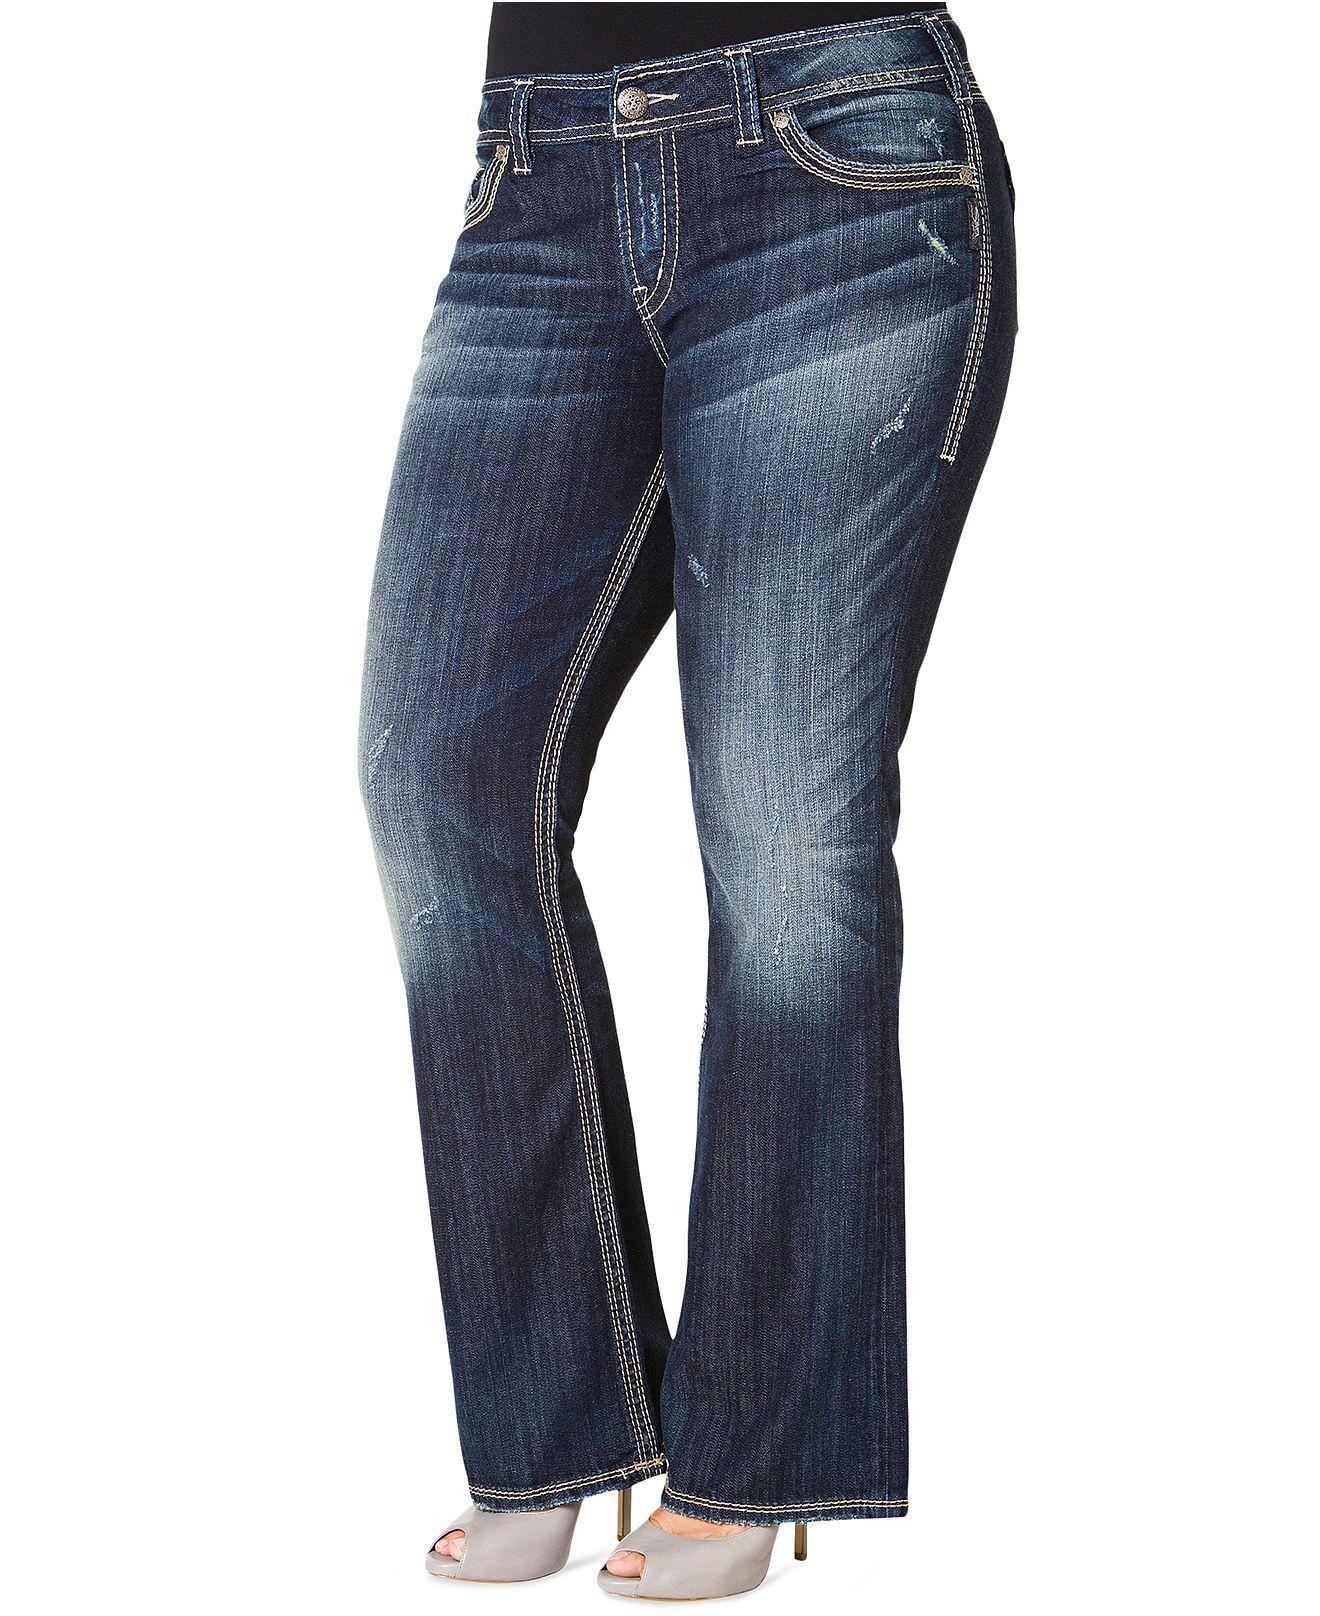 Suki Silver Jeans Clearance - Xtellar Jeans